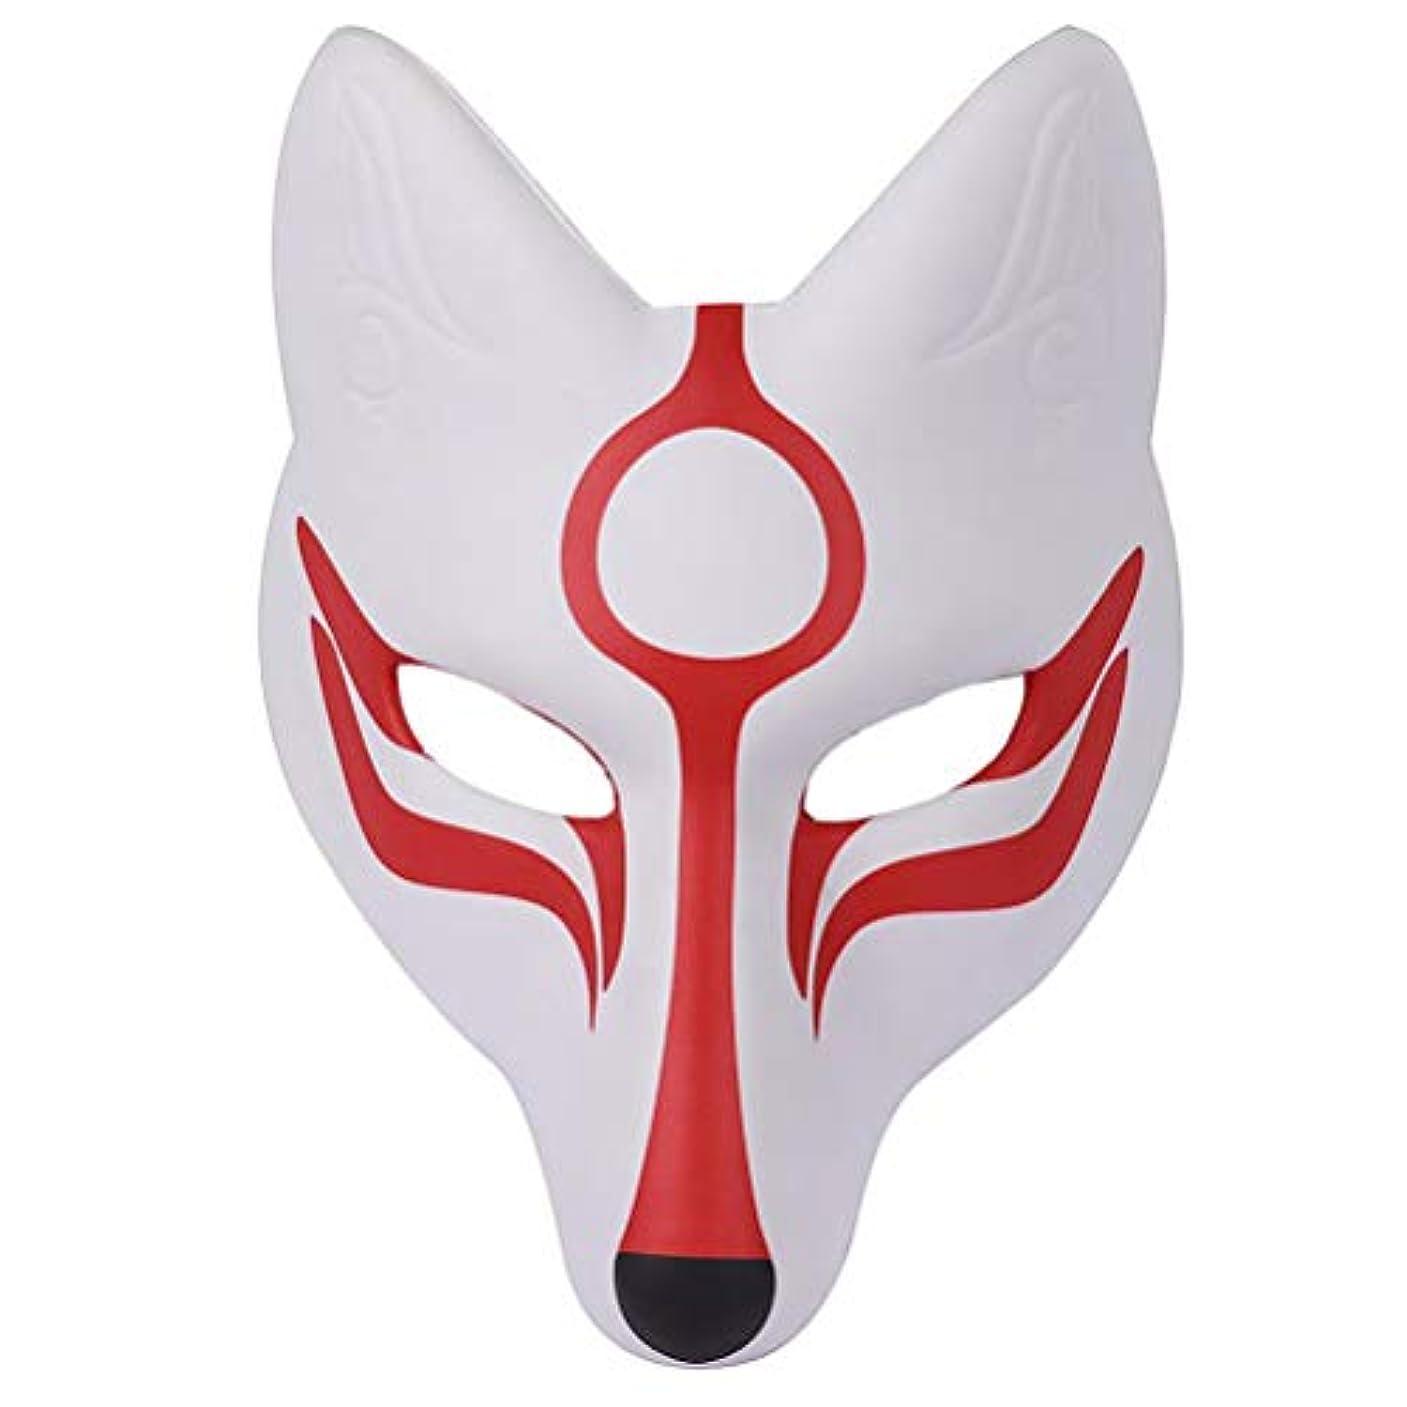 AMOSFUN フォックスマスク日本歌舞伎きつねマスク用男性女性子供ハロウィーン仮装衣装プロップ